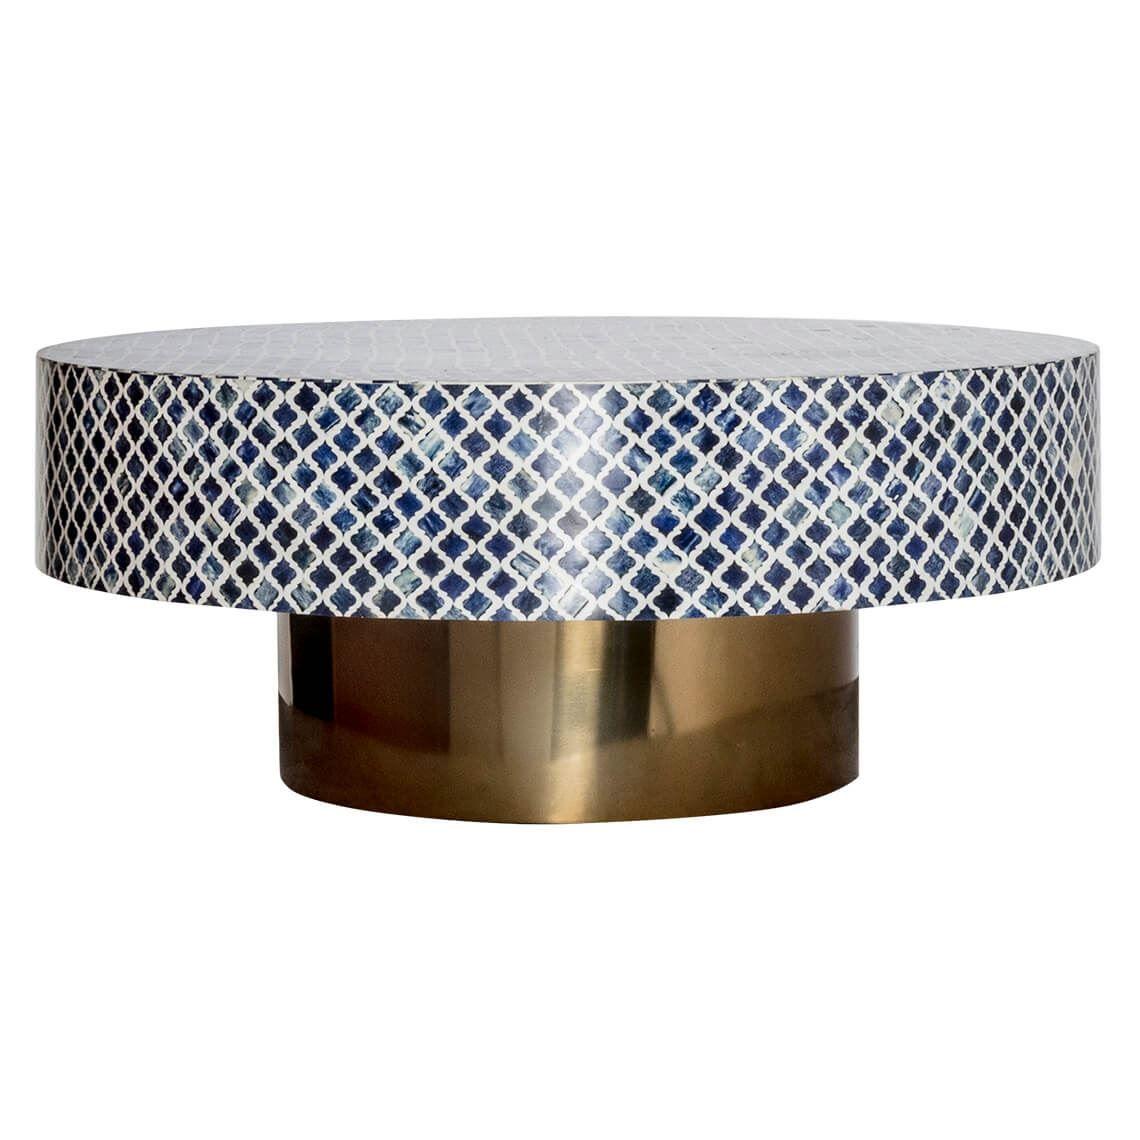 Fira Coffee Table Blue Brass Colour Blue Coffee Tables Tiled Coffee Table Freedom Coffee Table [ 1140 x 1140 Pixel ]